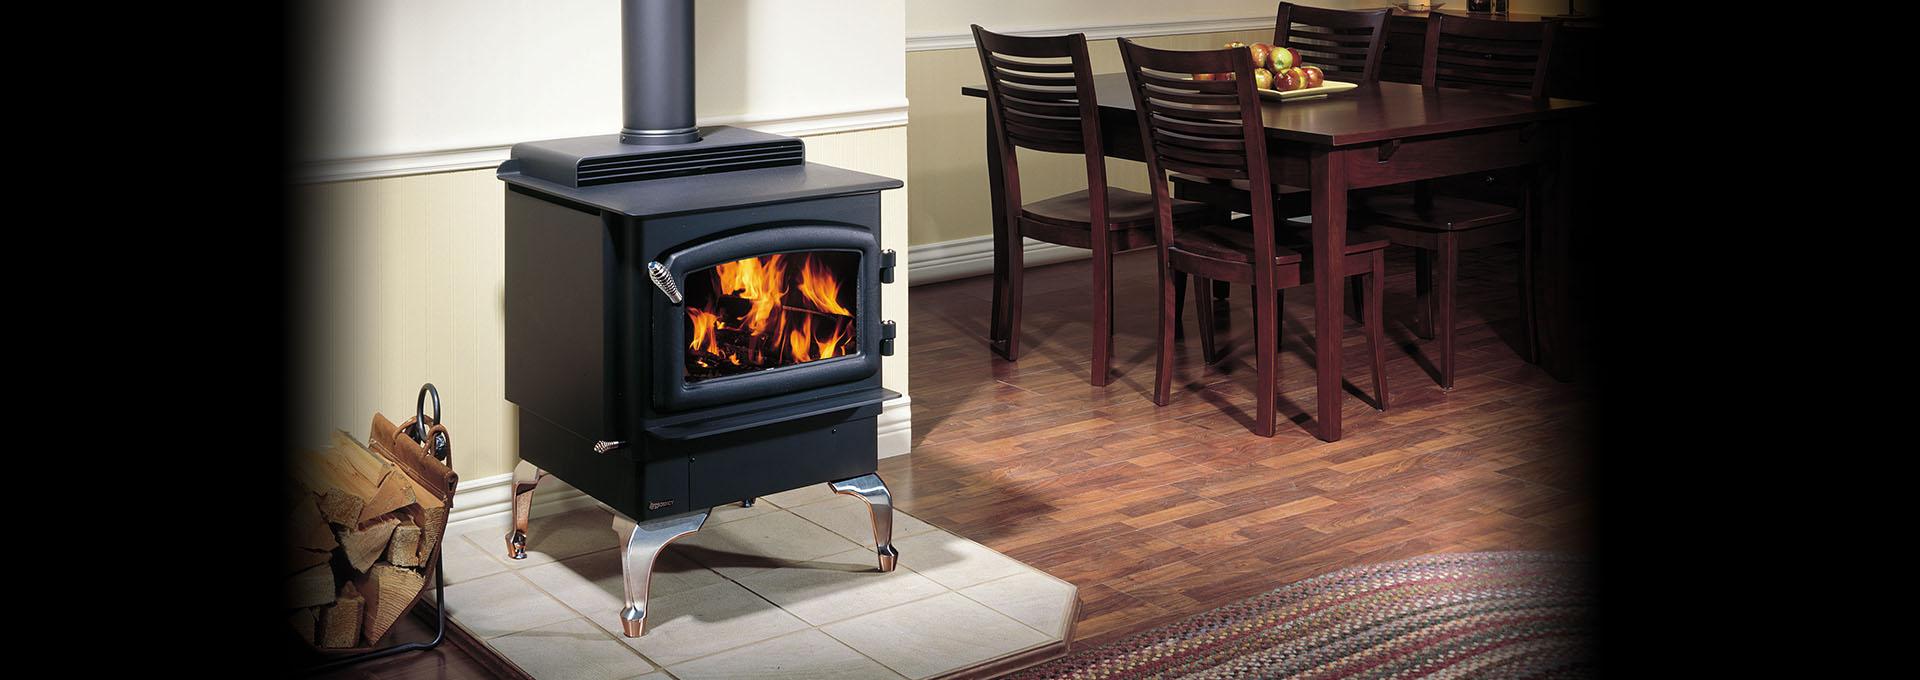 f2400 medium wood stove regency fireplace products rh regency fire com Regency Stoves Regency Insert 2400